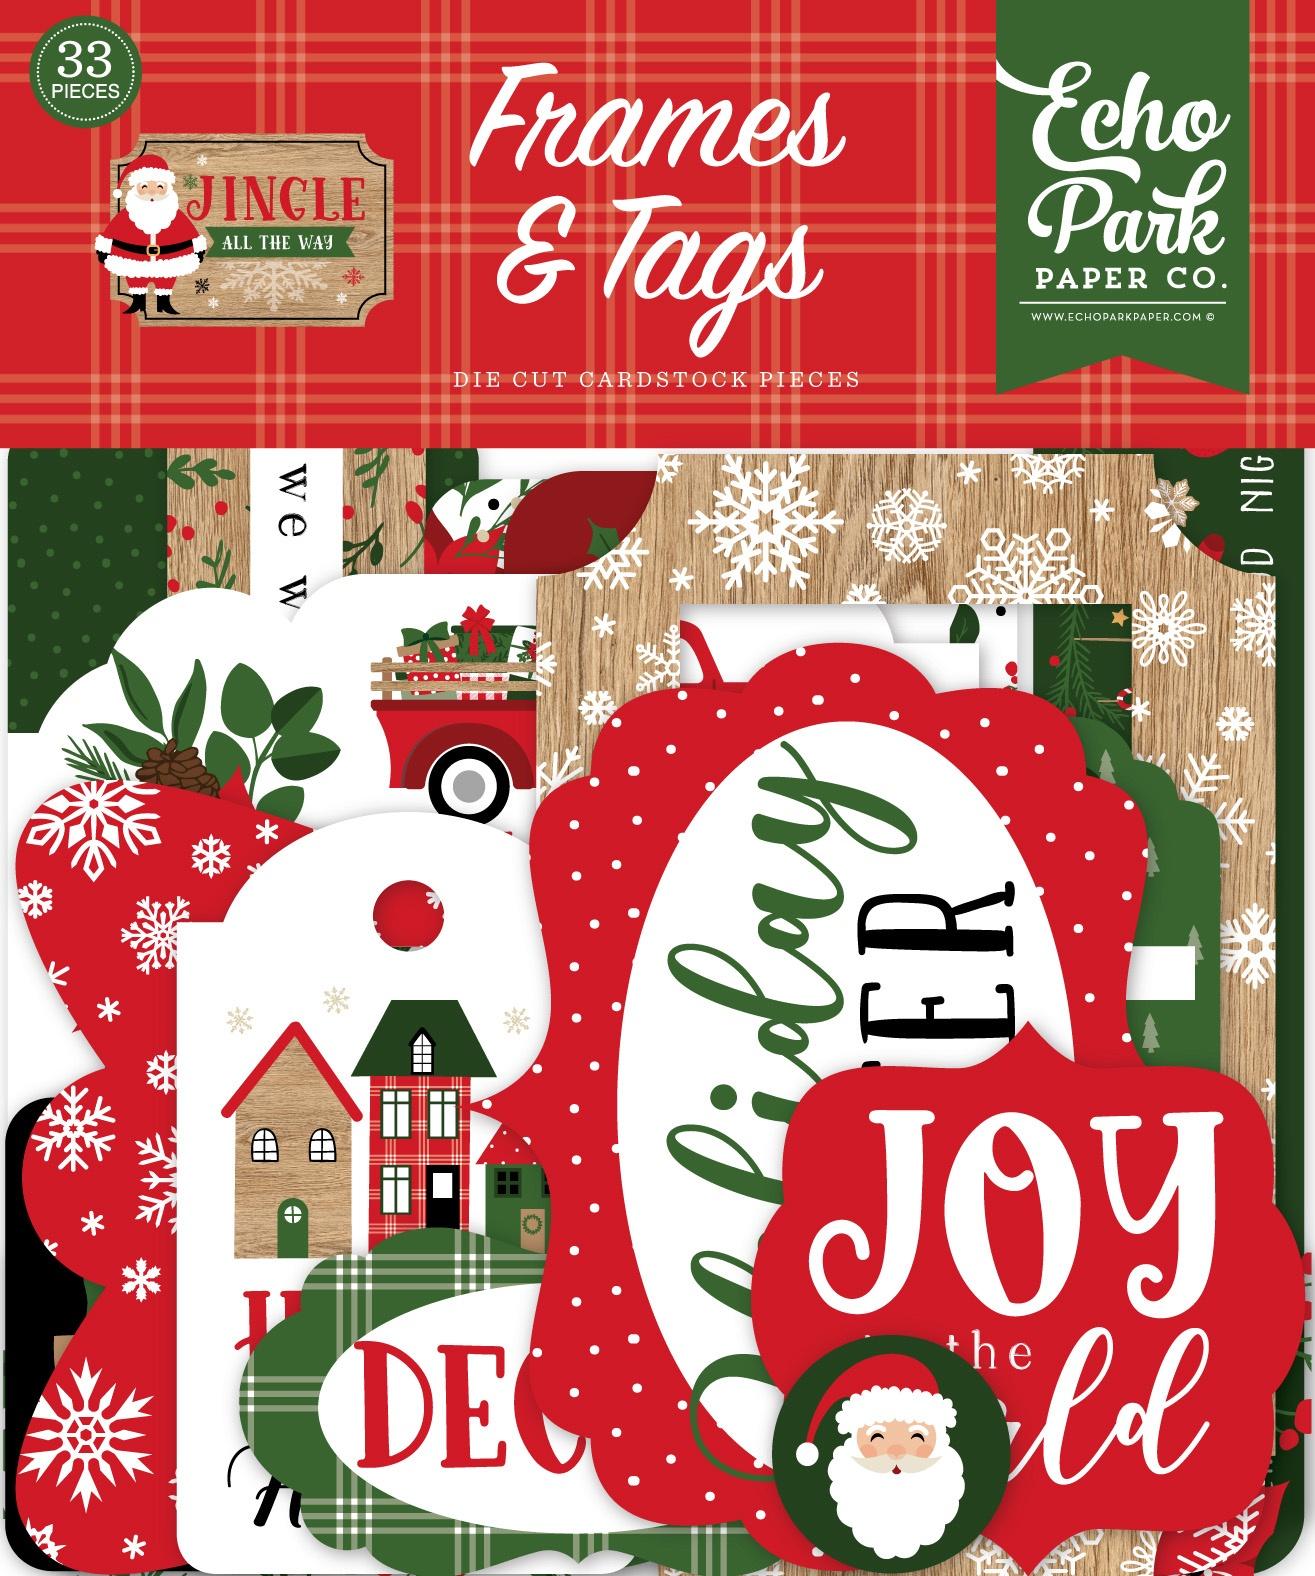 Echo Park - Jingle All The Way - Frames & Tags